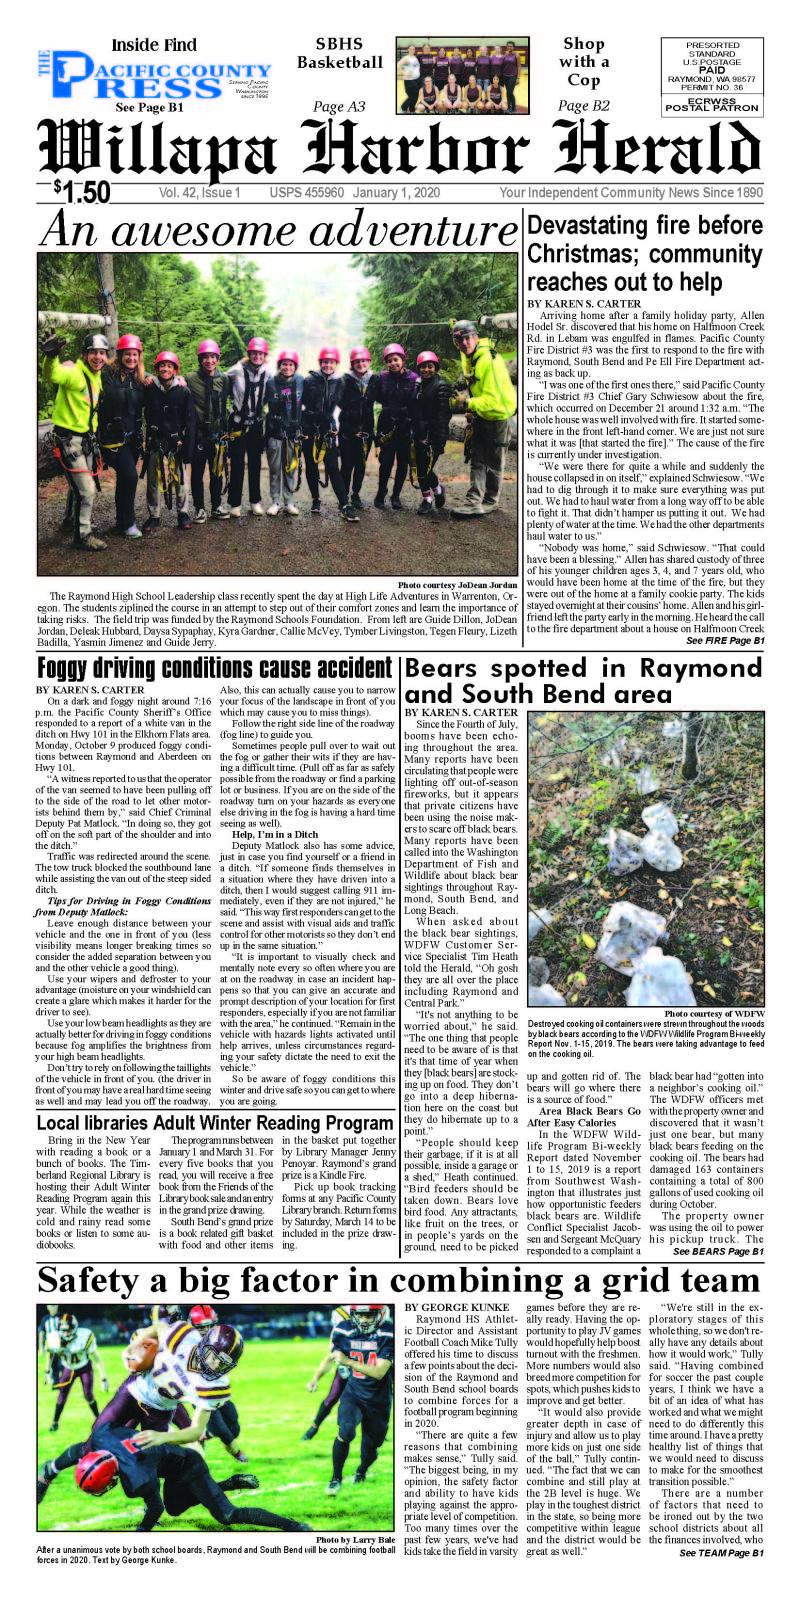 January 1, 2020 Willapa Harbor Herald and Pacific County Press